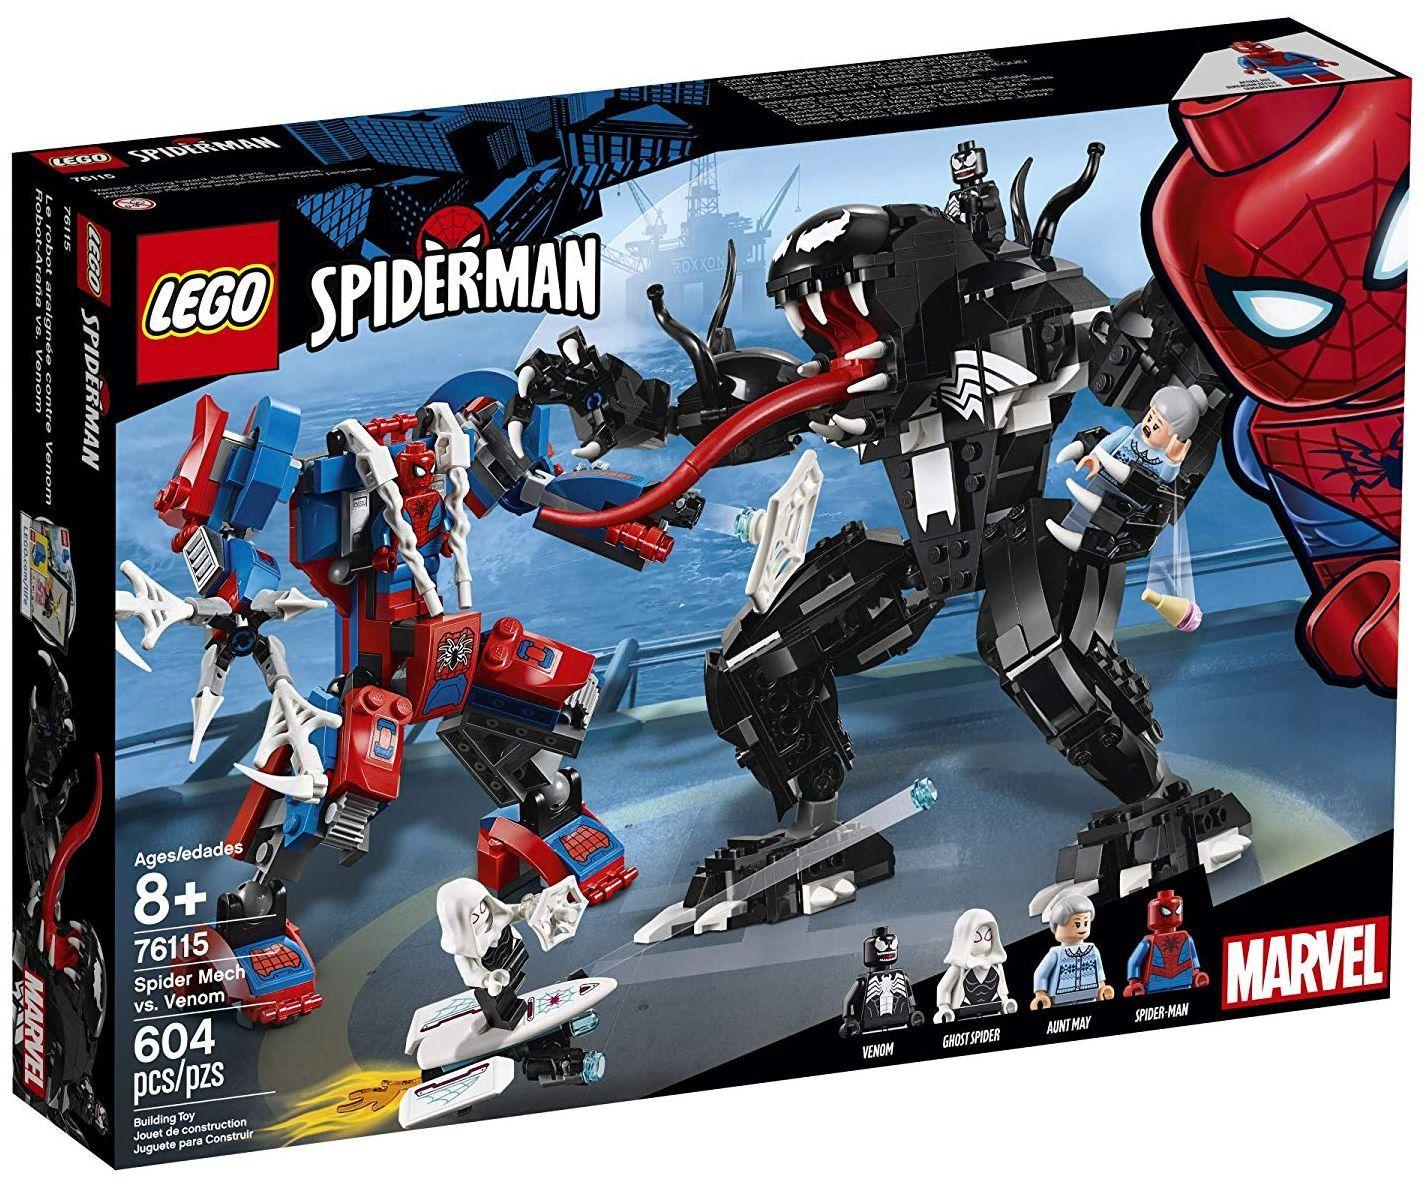 Конструктор Lego Marvel Super Heroes - Spider Mech vs. Venom (76115) - 6